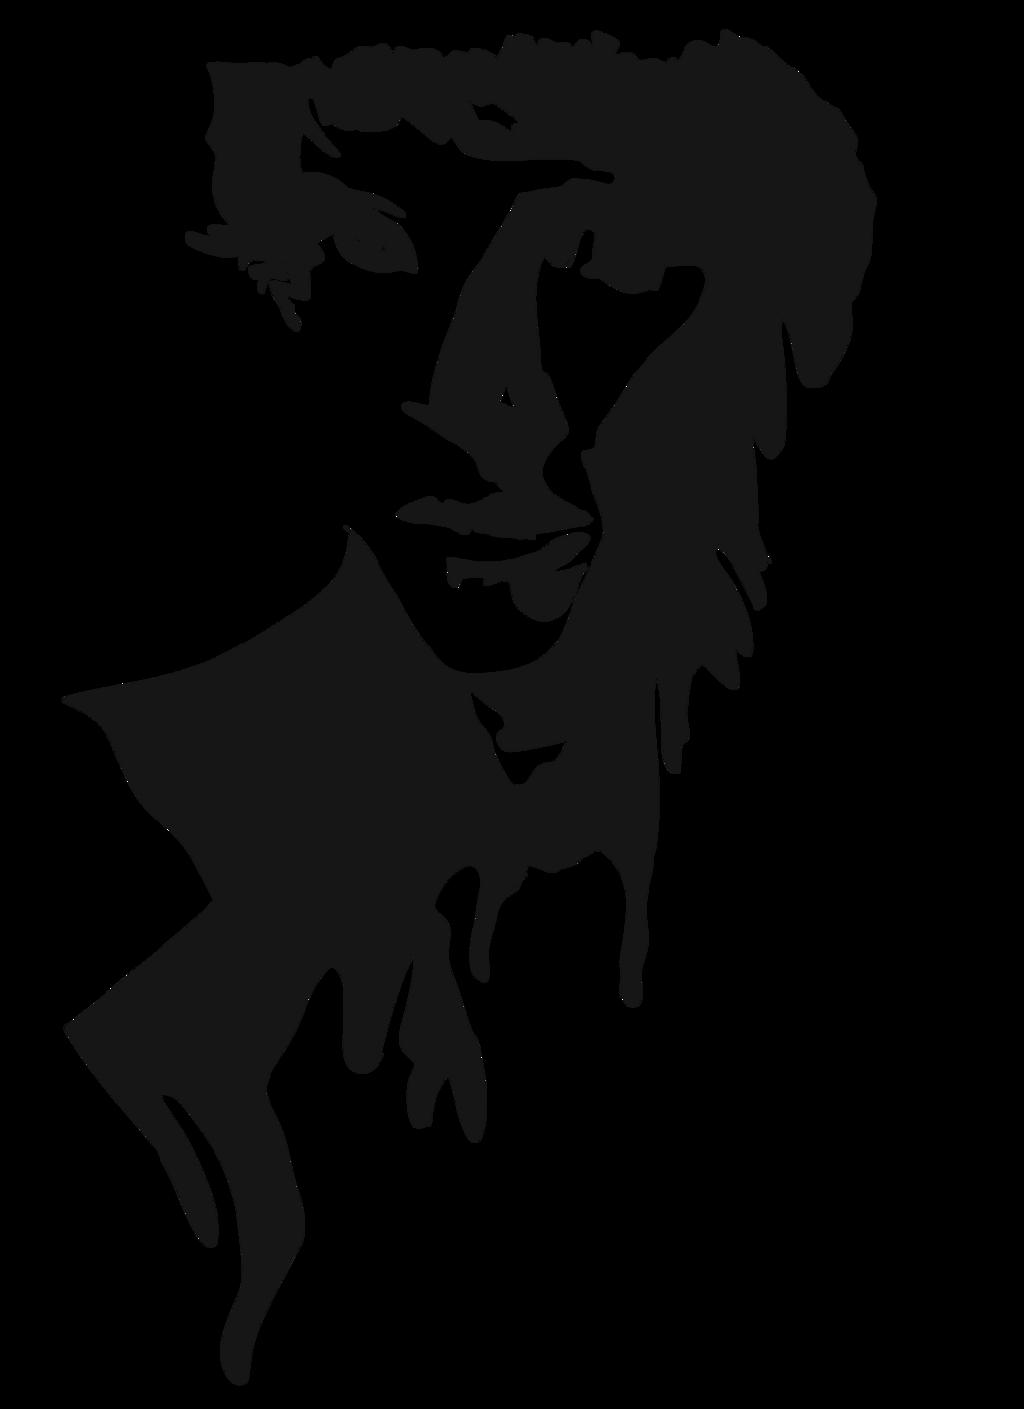 1024x1409 Sherlock Silhouette (Bbc) By Anikavandermeulen